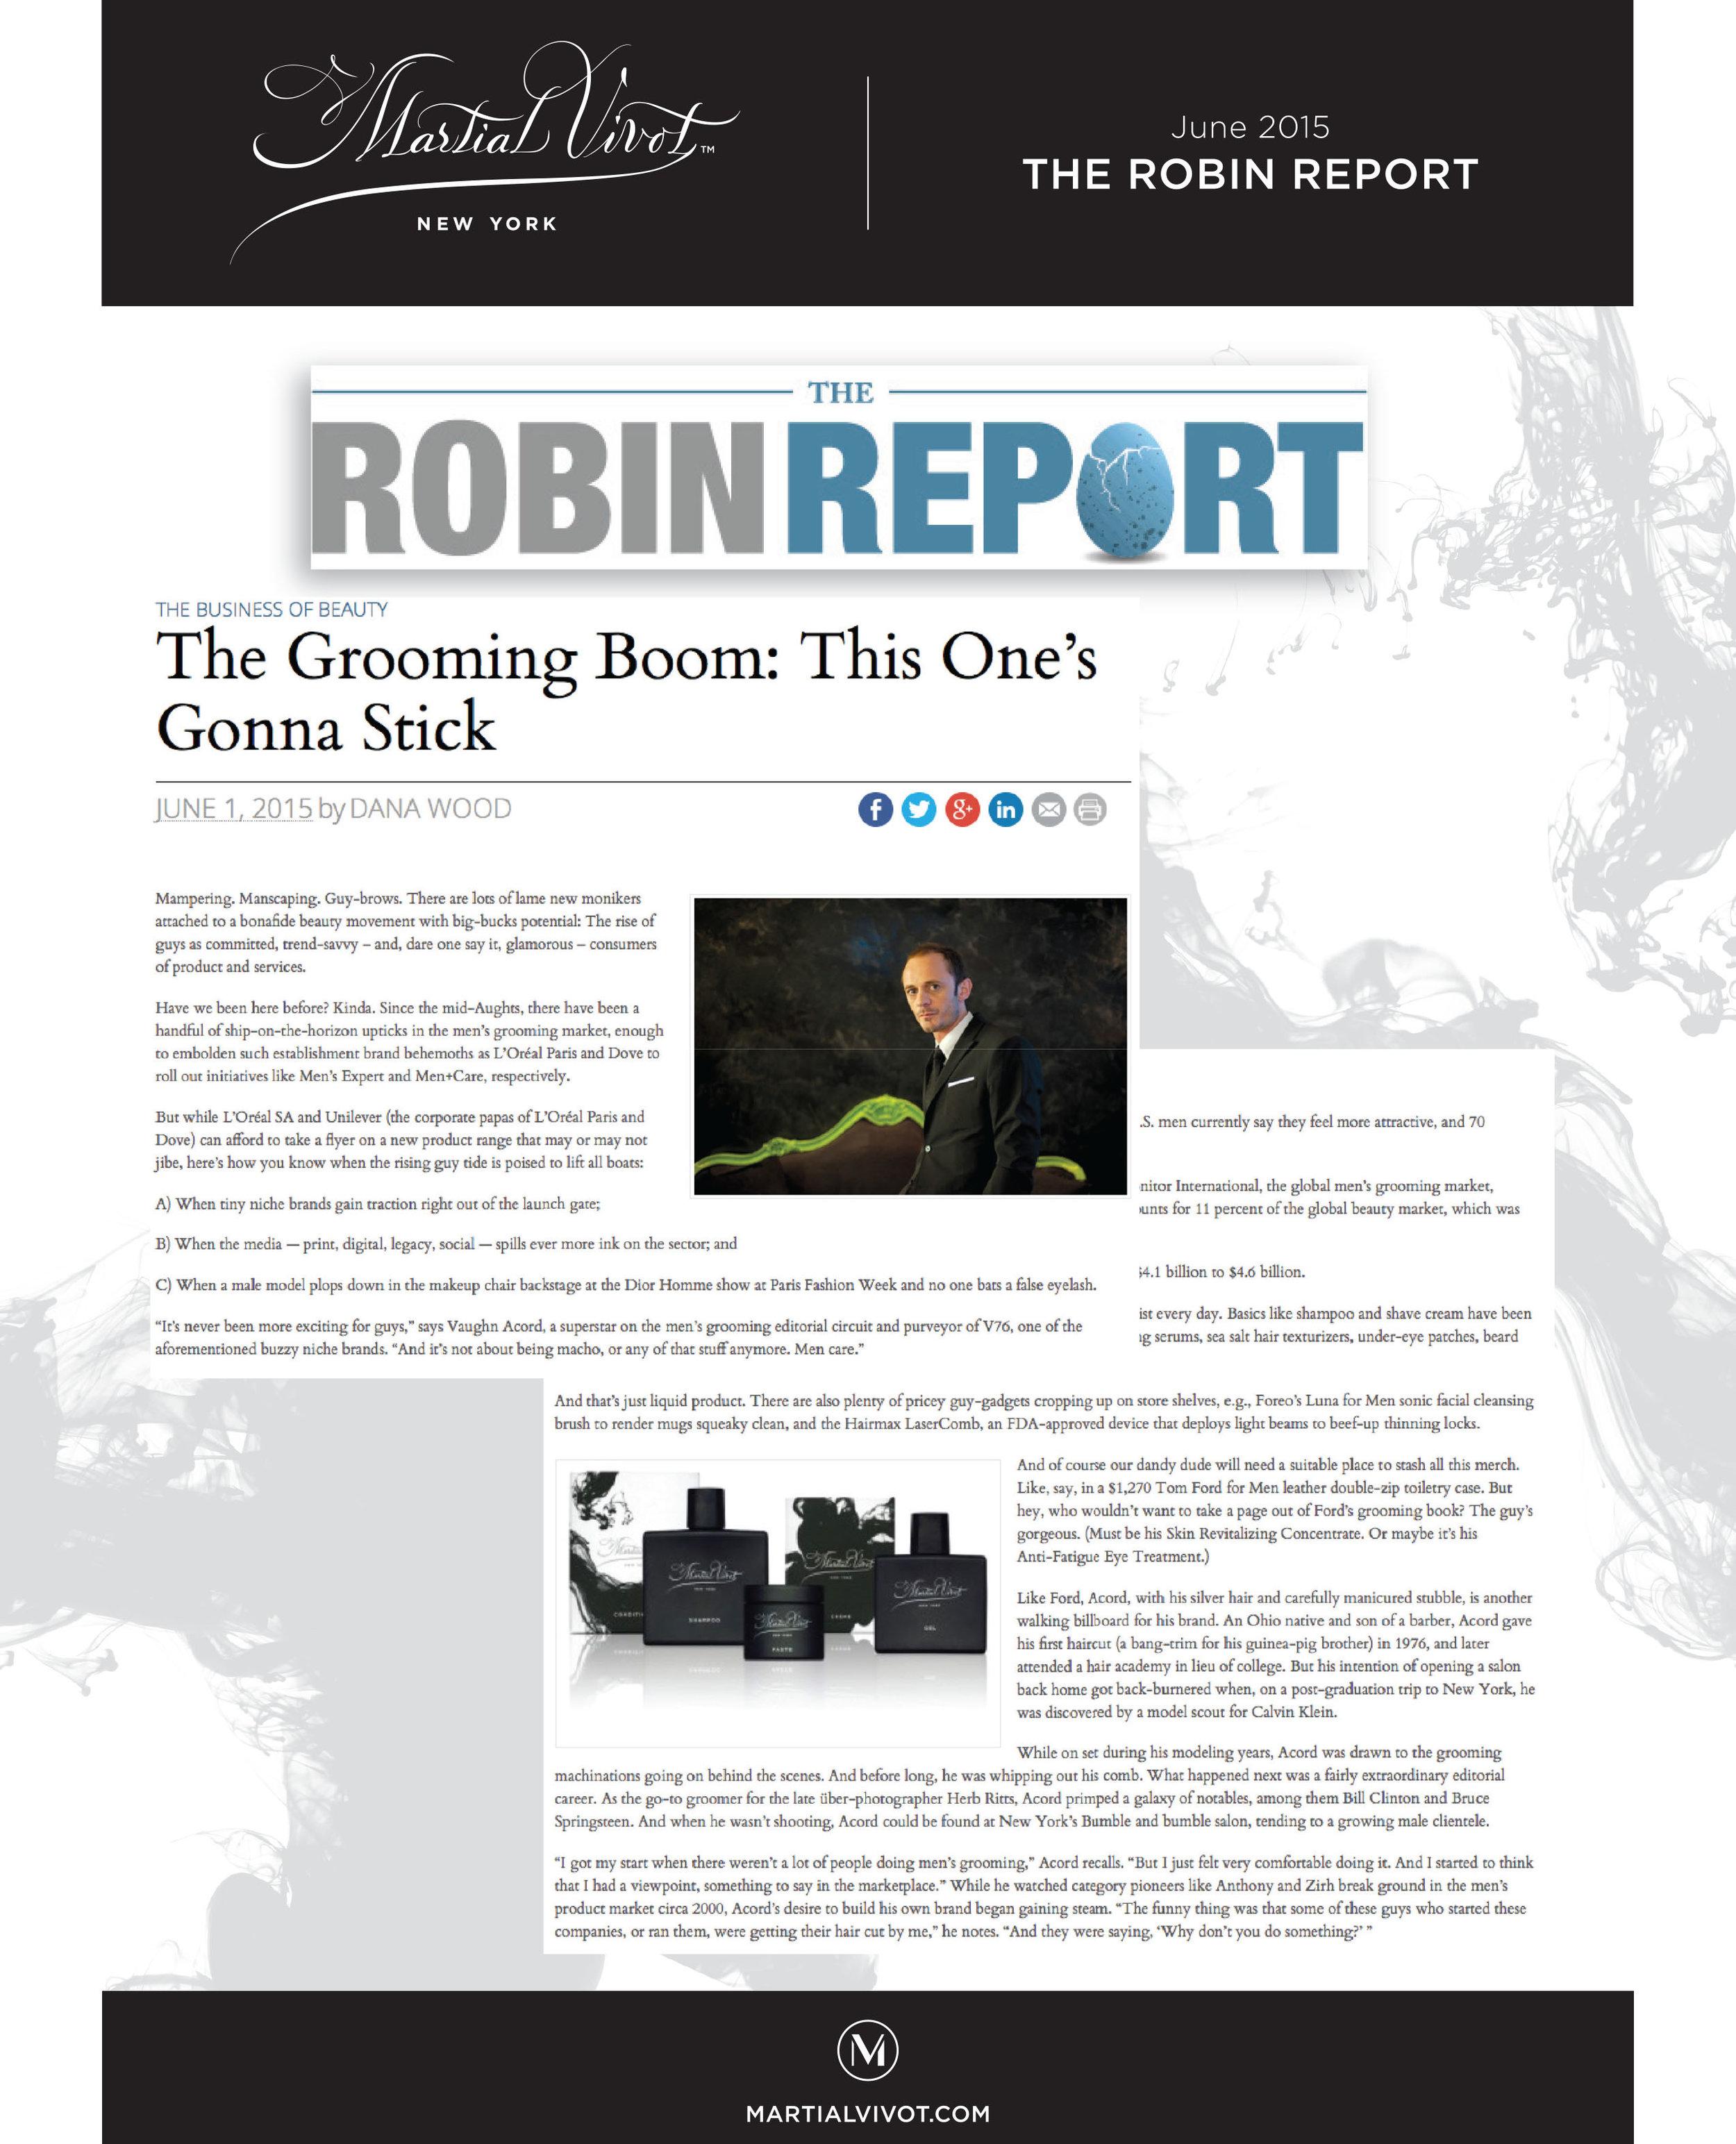 TheRobinReport Jun15.jpg